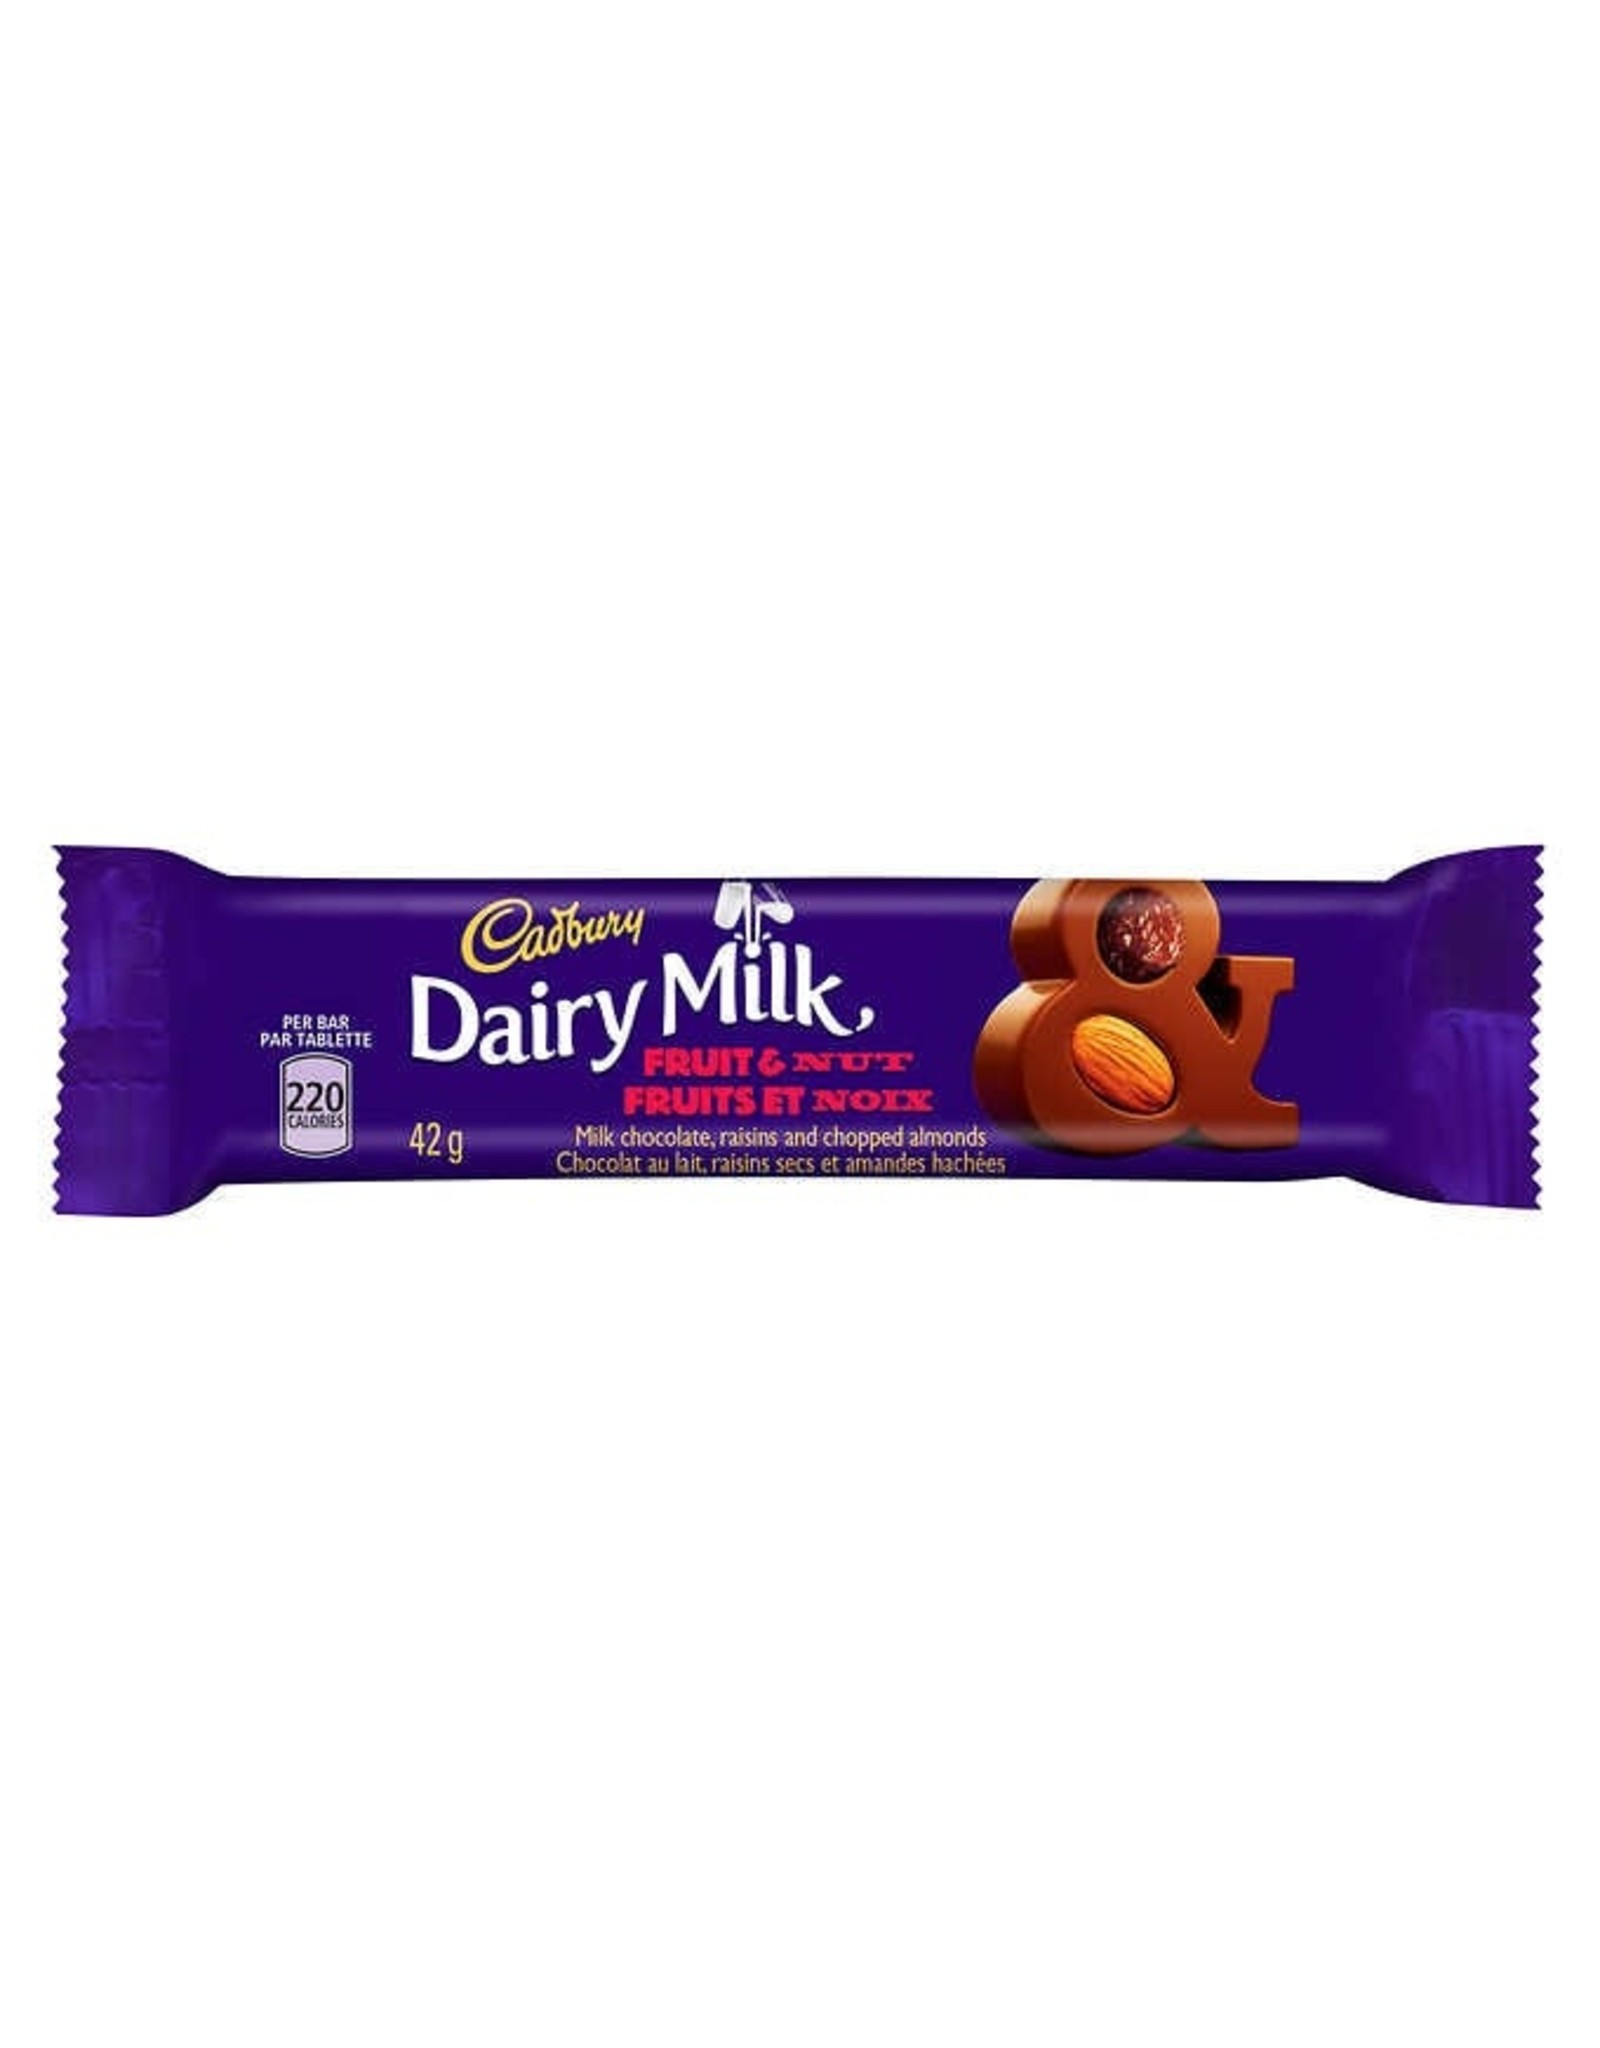 Cadbury Dairy Milk Fruit & Nut Bar (British)